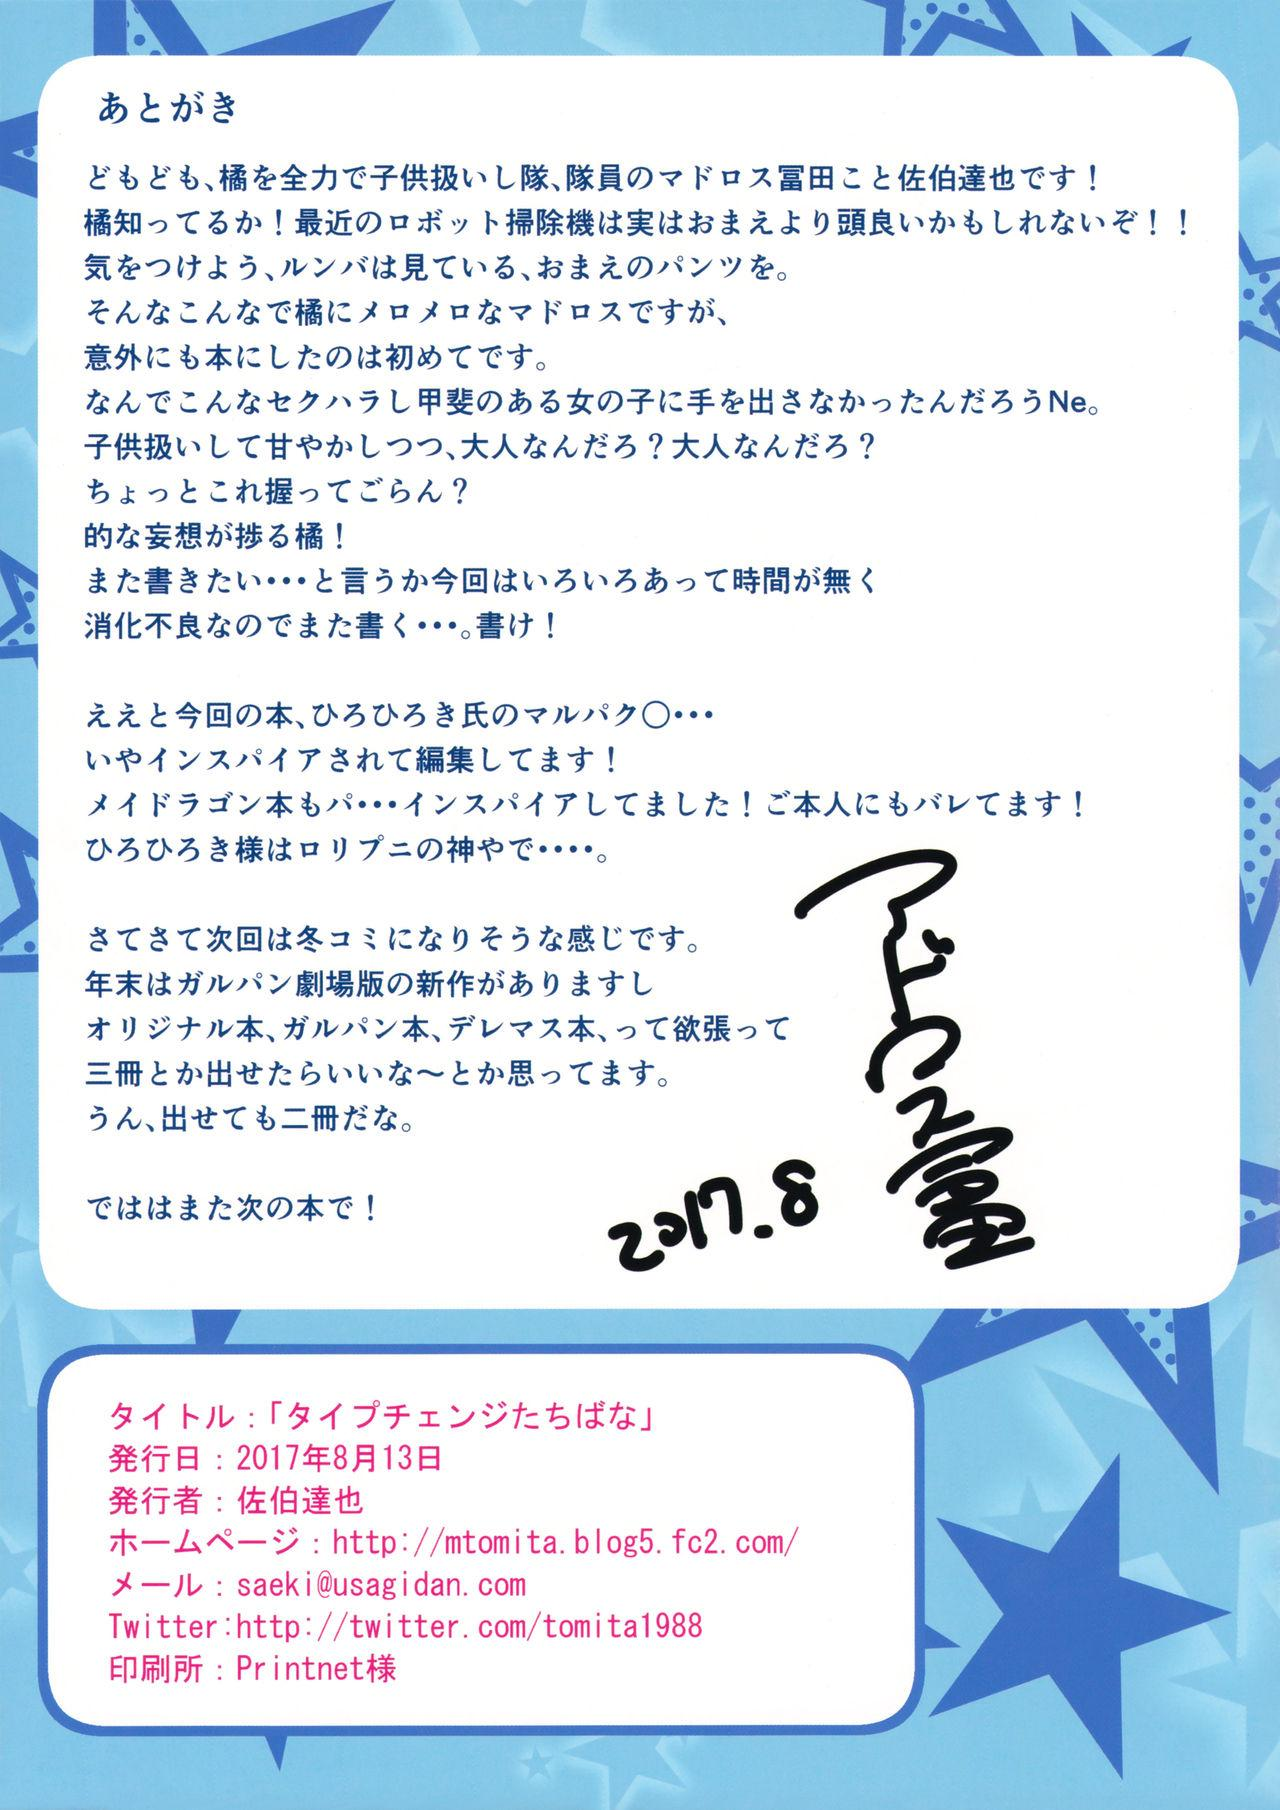 Type Change Tachibana 11